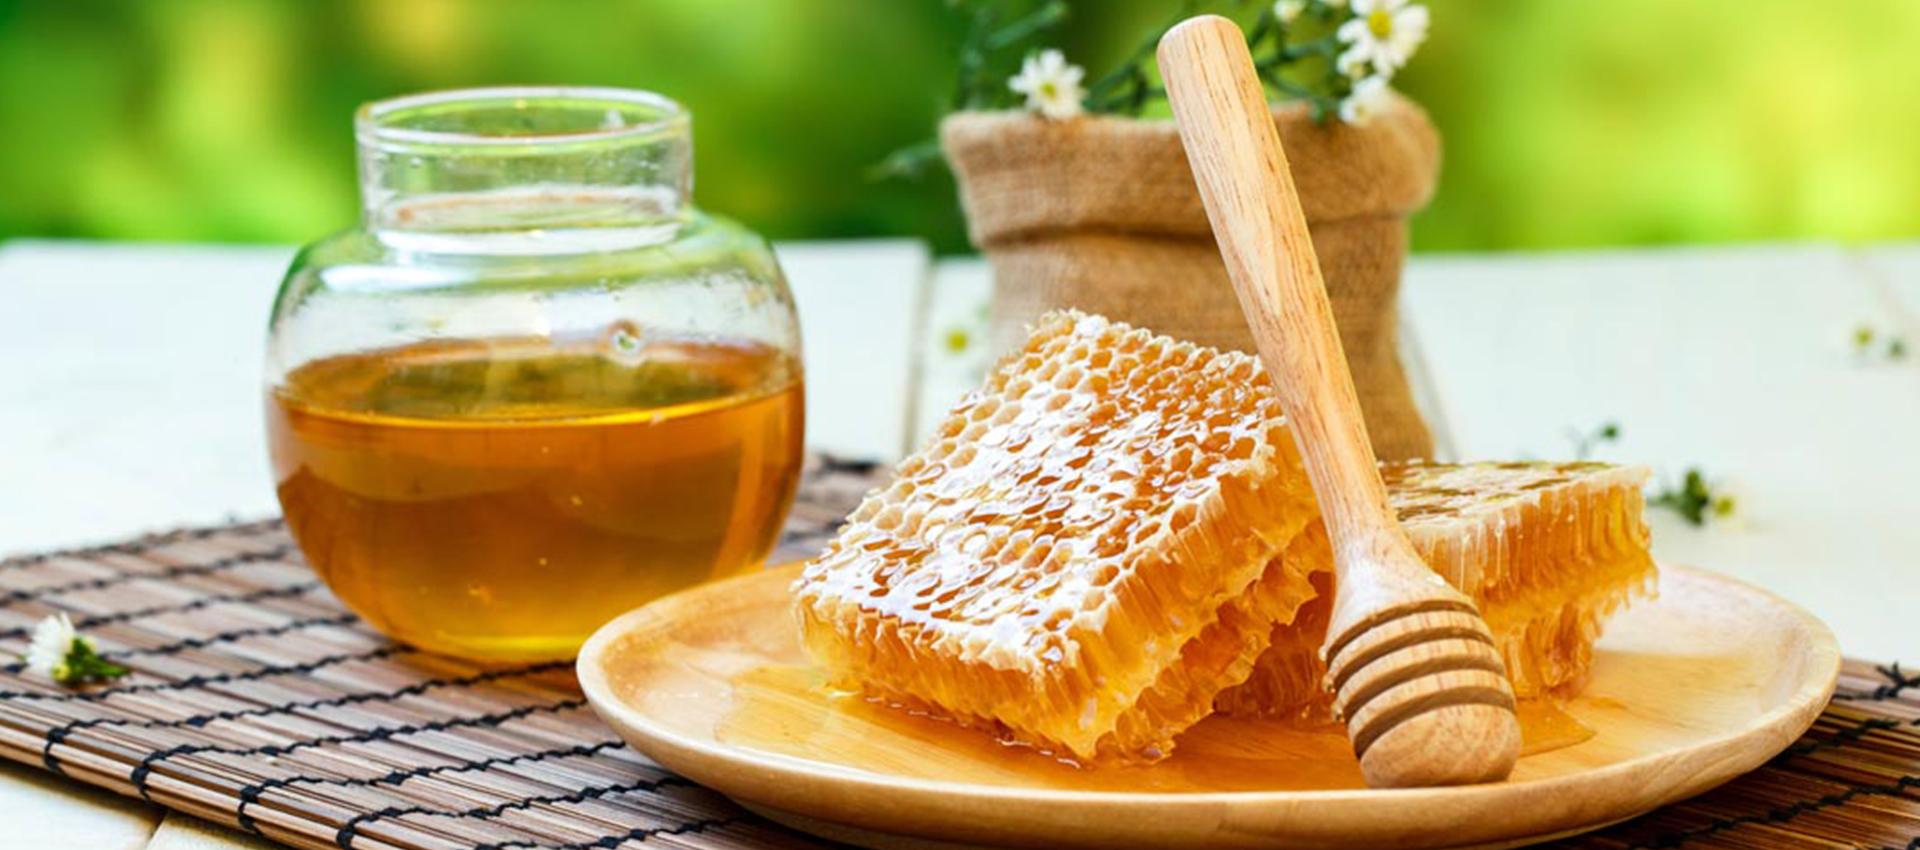 Profesorius: medaus negalima valgyti be saiko   jusukalve.lt